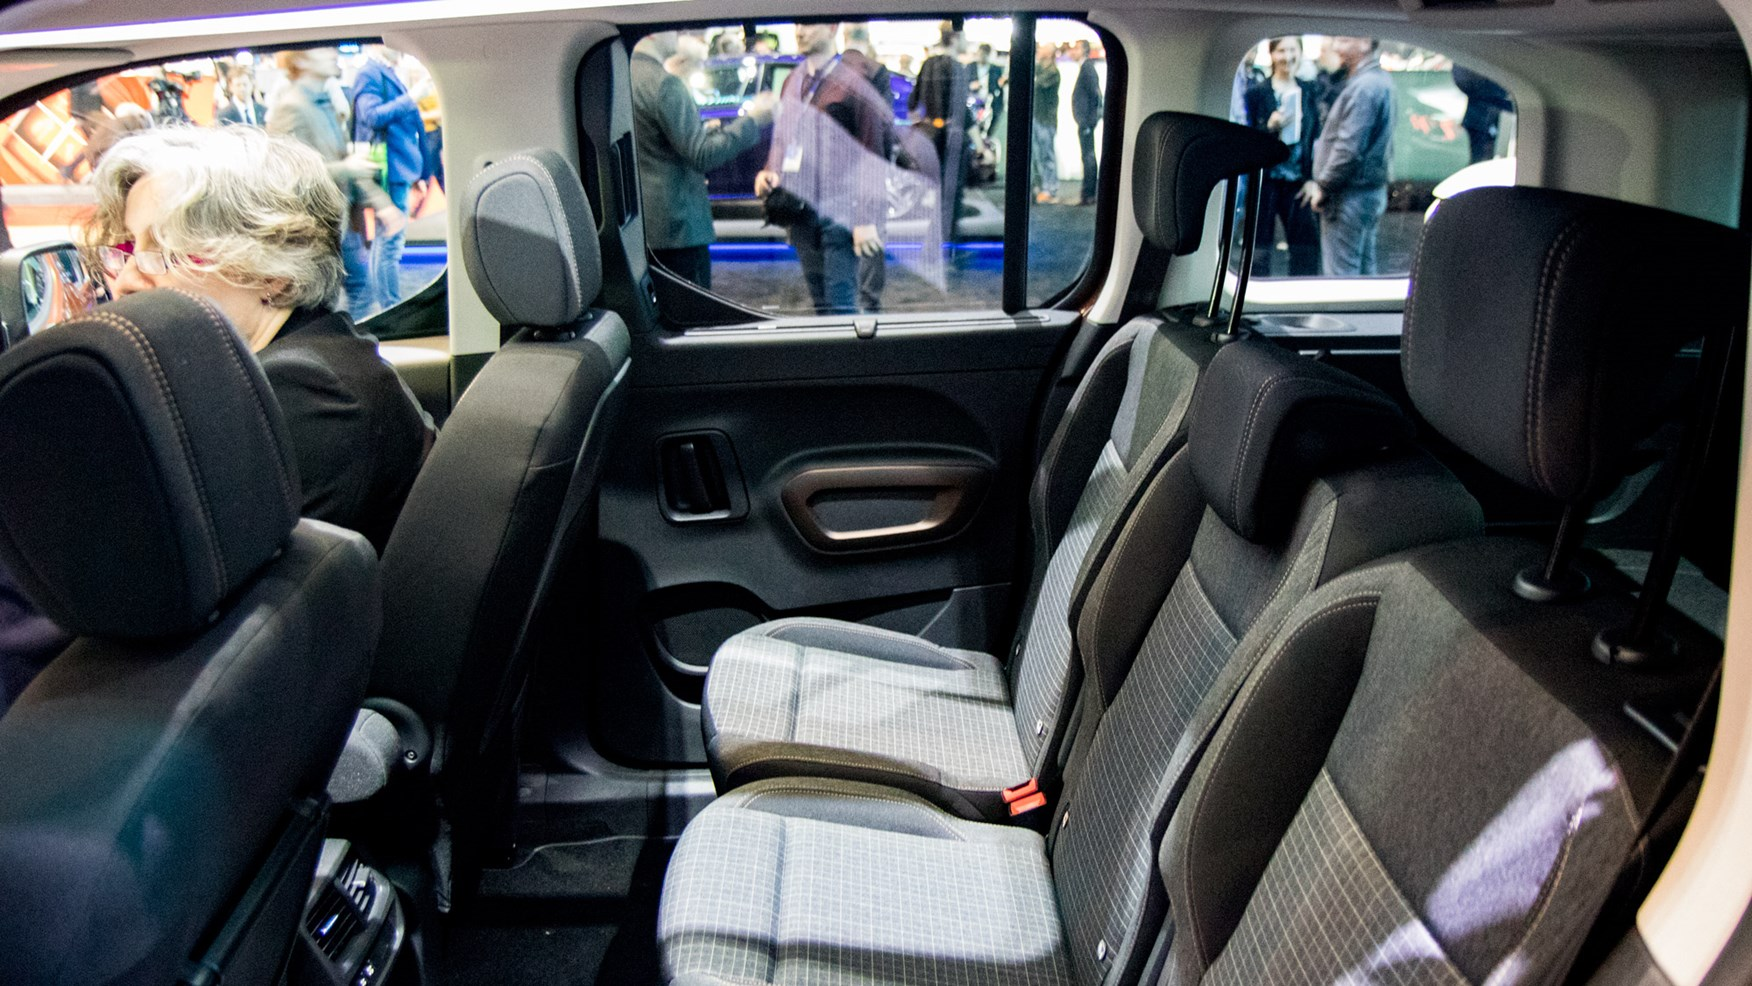 peugeot rifter uk price of mpv revealed car magazine. Black Bedroom Furniture Sets. Home Design Ideas